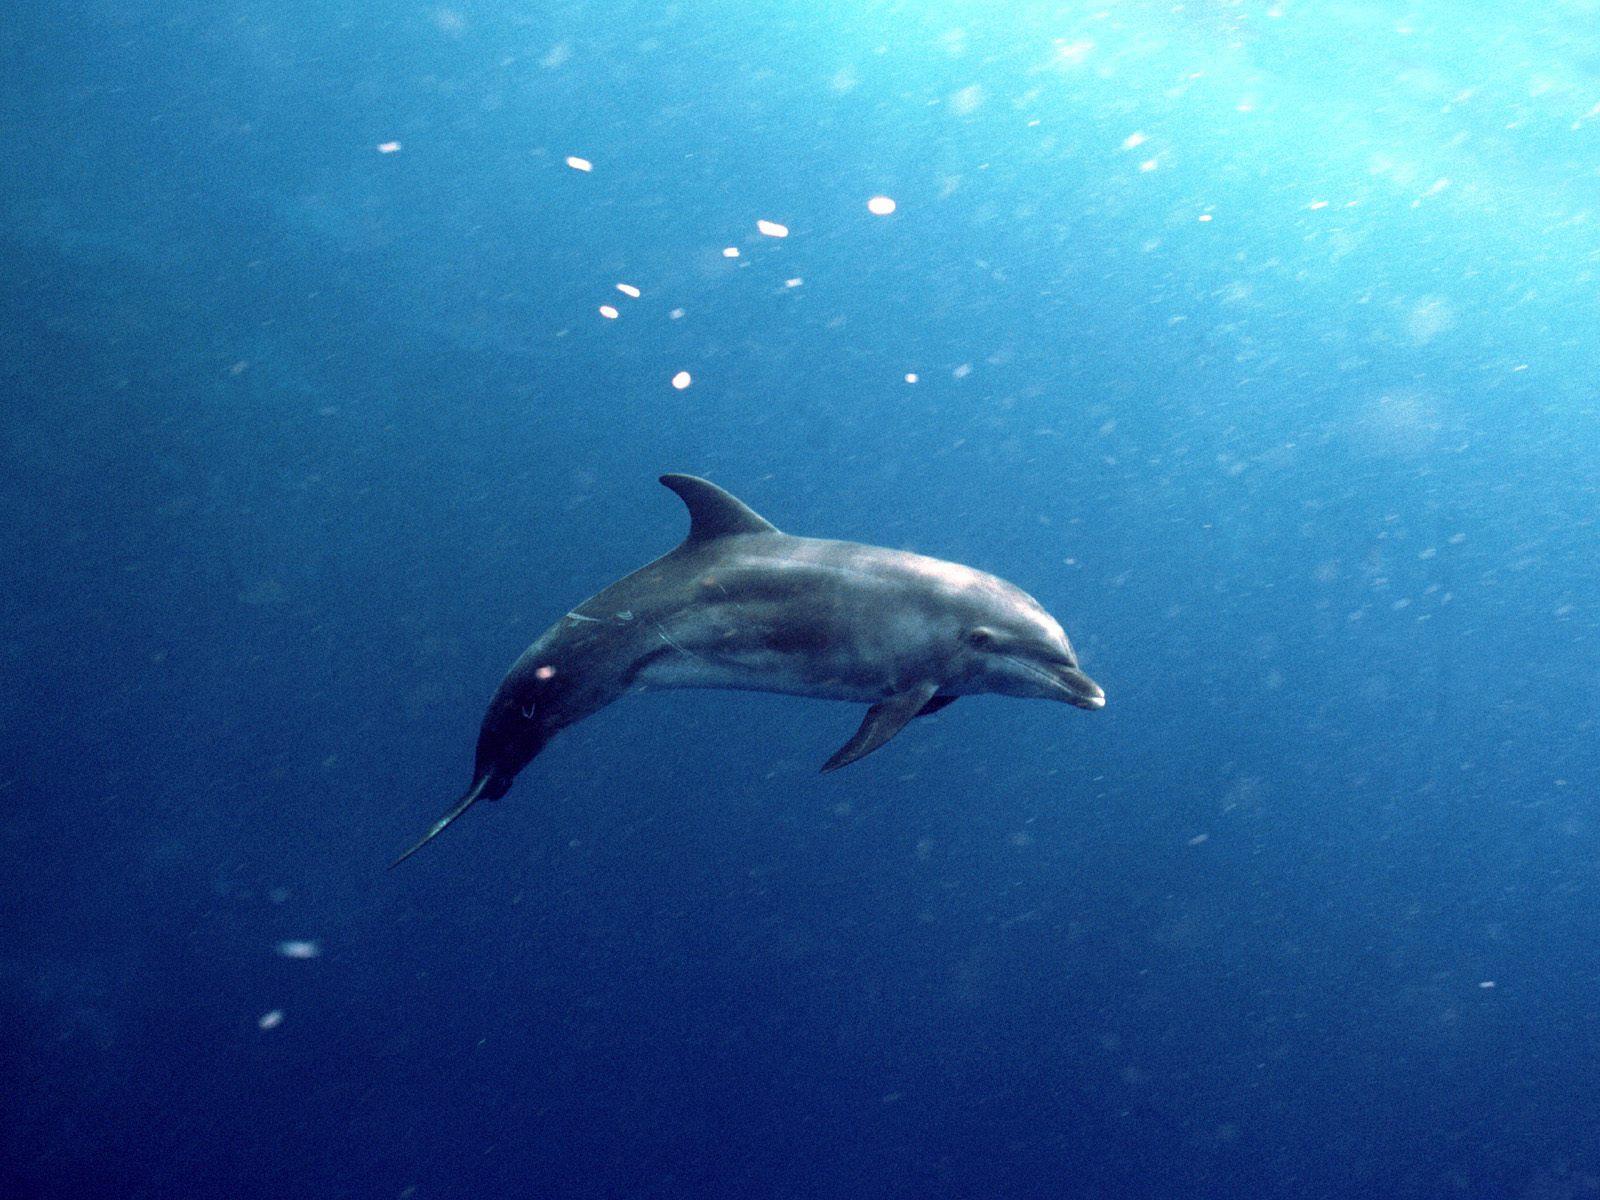 http://2.bp.blogspot.com/-PSZ-B_KePUo/Tg29EsIyuPI/AAAAAAAAA9o/qiAmLcToDVg/s1600/Underwater%2BWallpaper%2B%25252836%252529.jpg